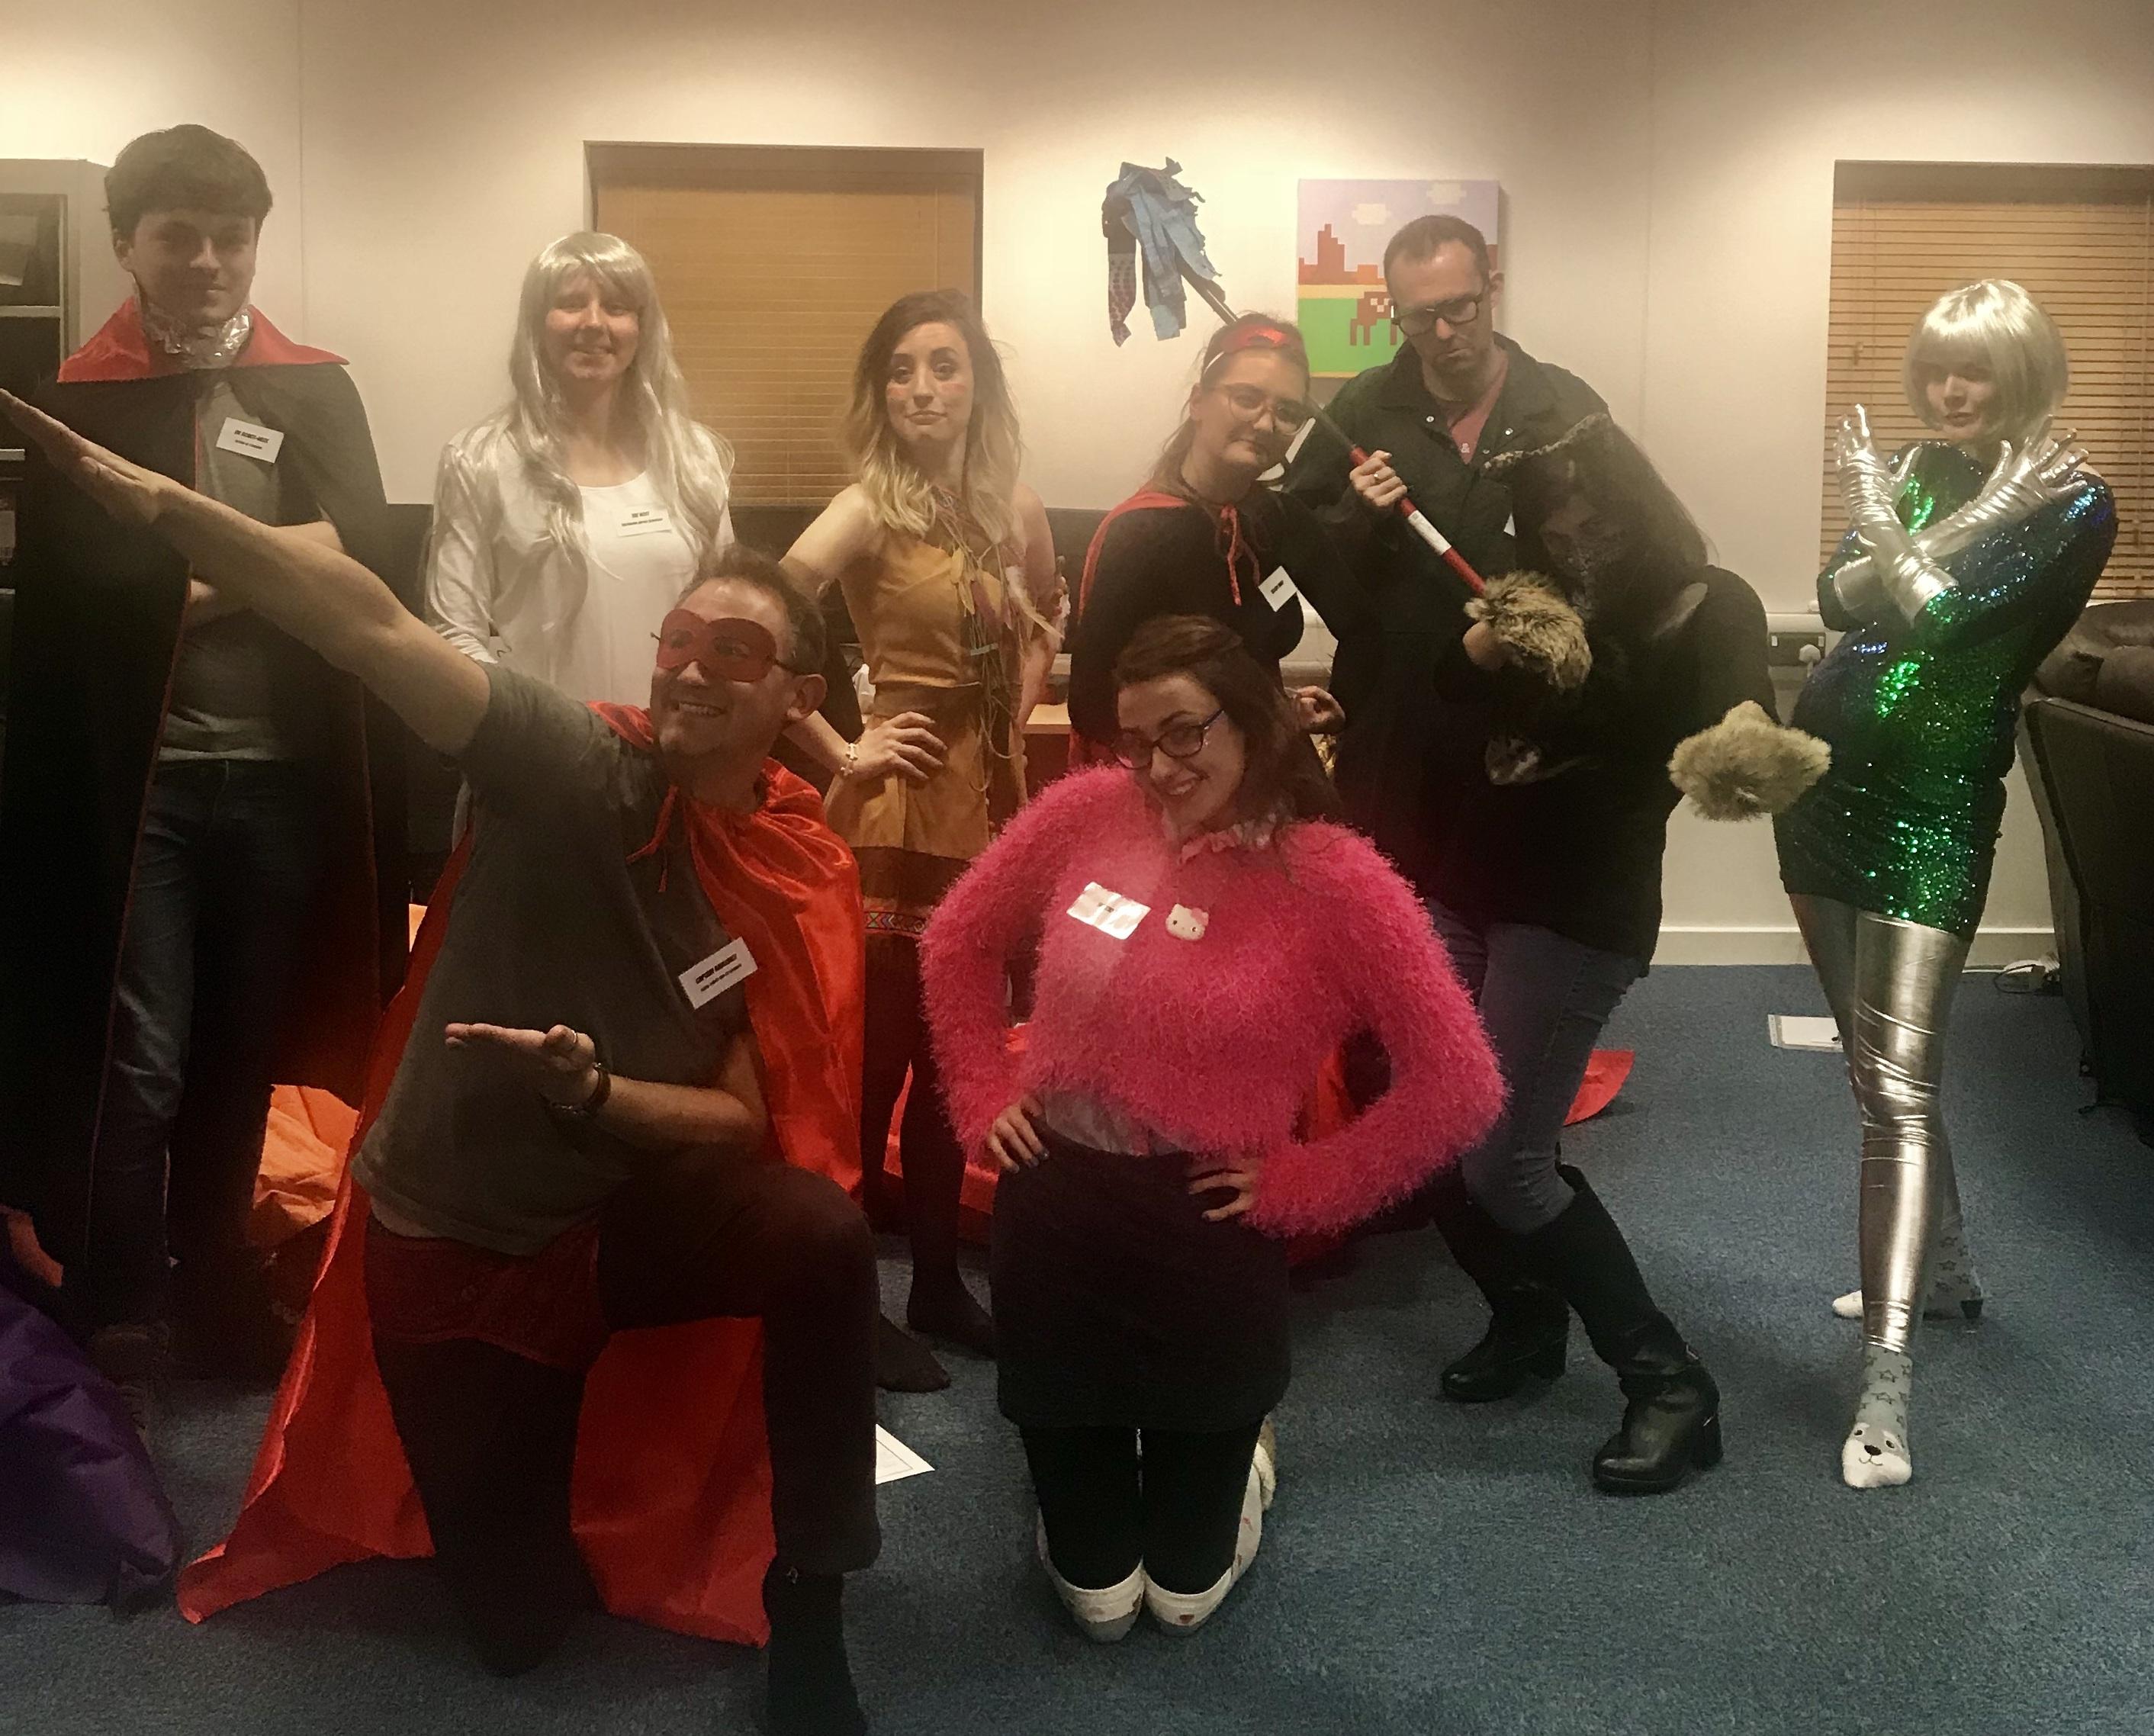 Everyone in costume